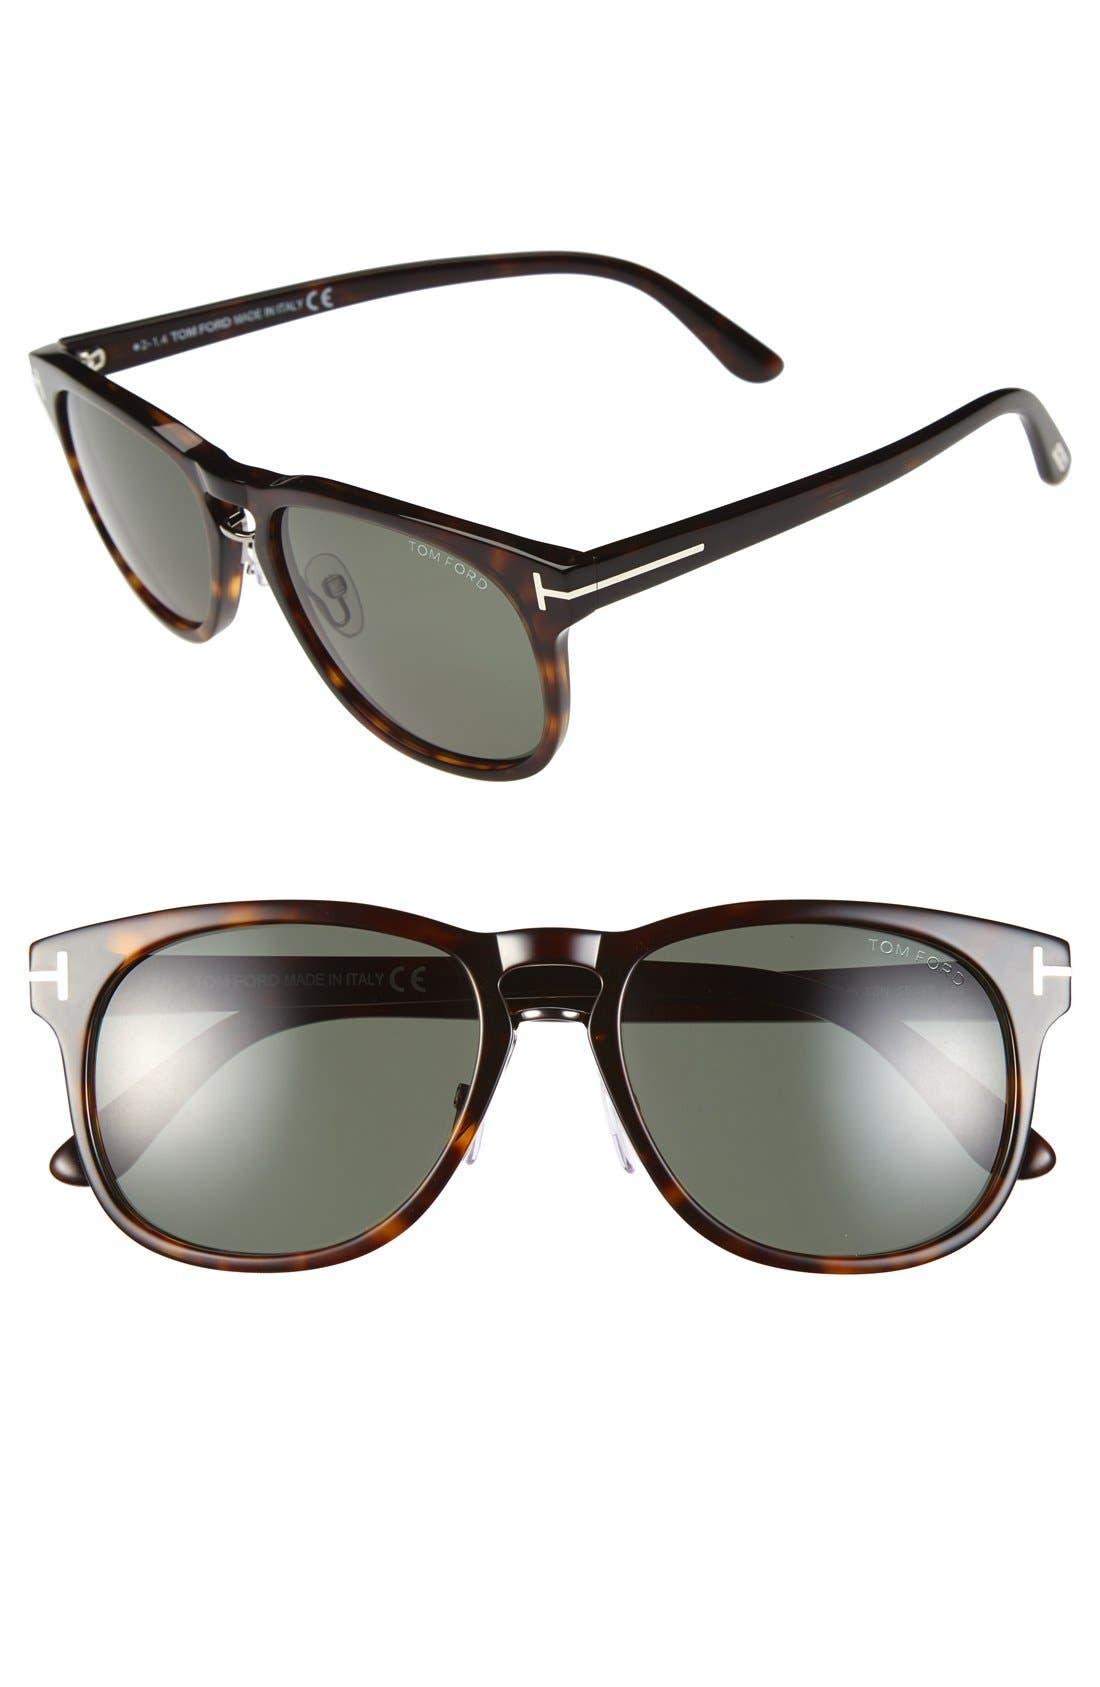 Main Image - Tom Ford 'Franklin' 55mm Sunglasses